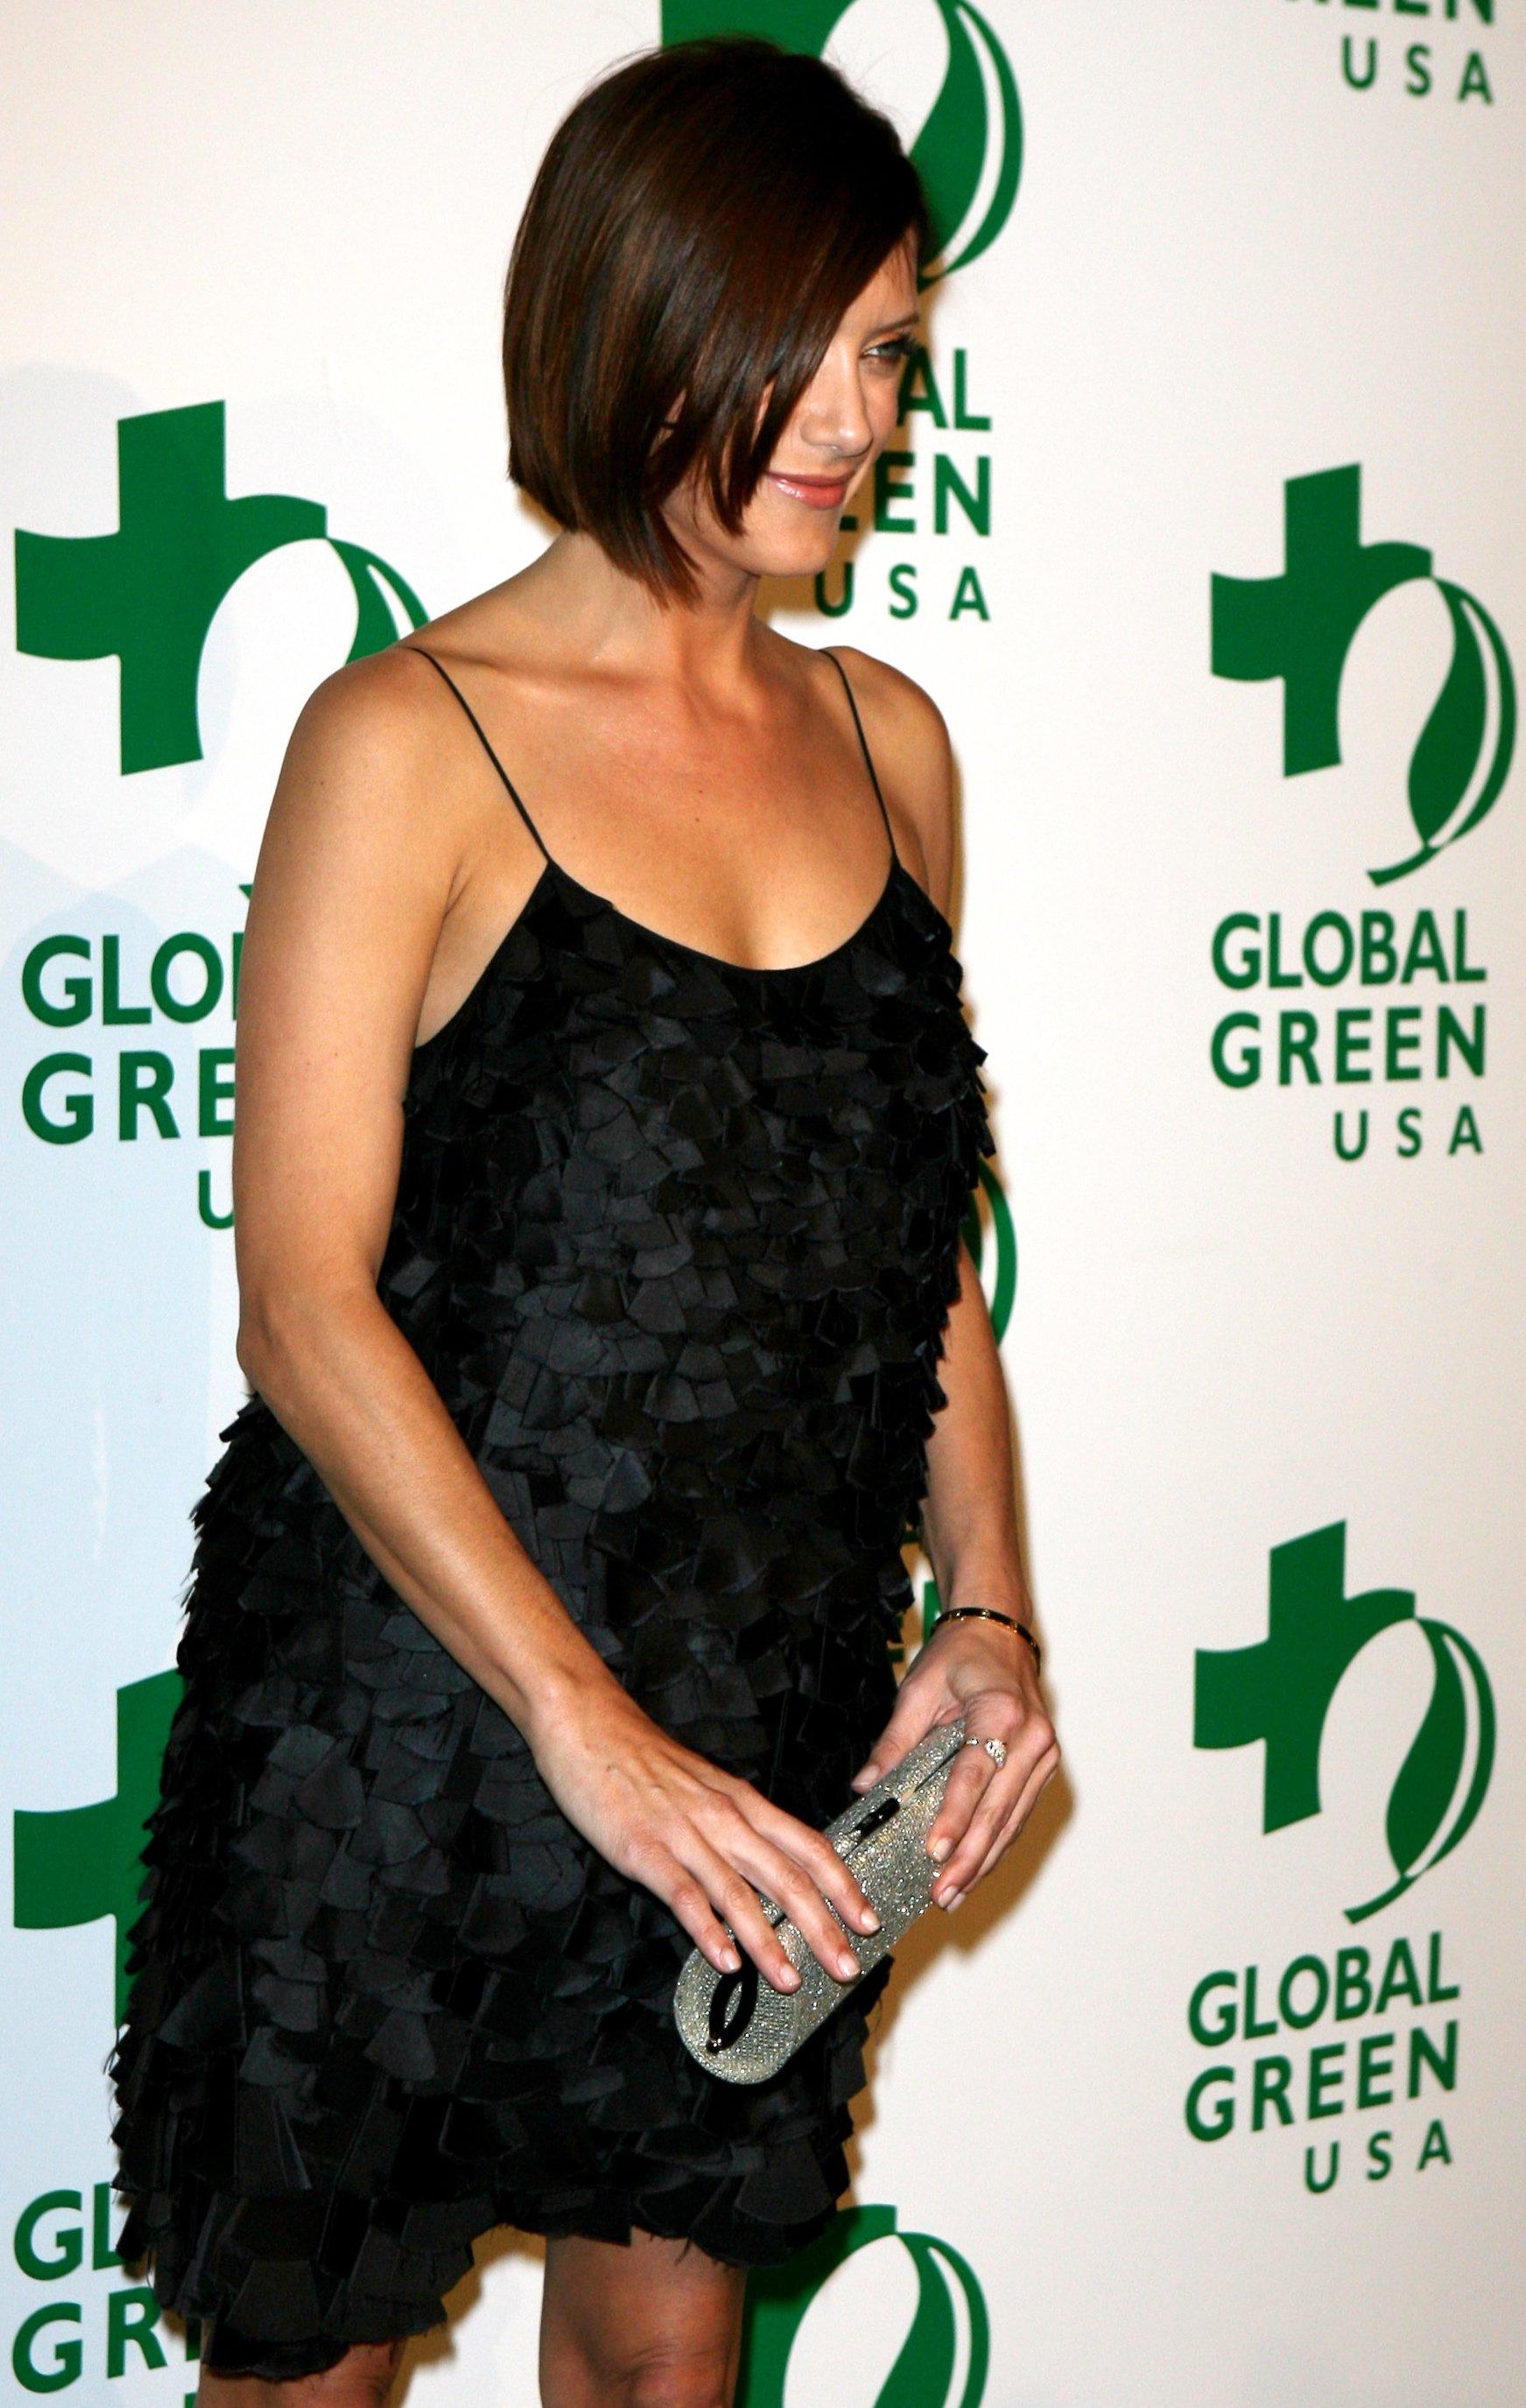 53318_Celebutopia-Kate_Walsh-Global_Green_Pre-Oscar_Party-08_122_167lo.JPG